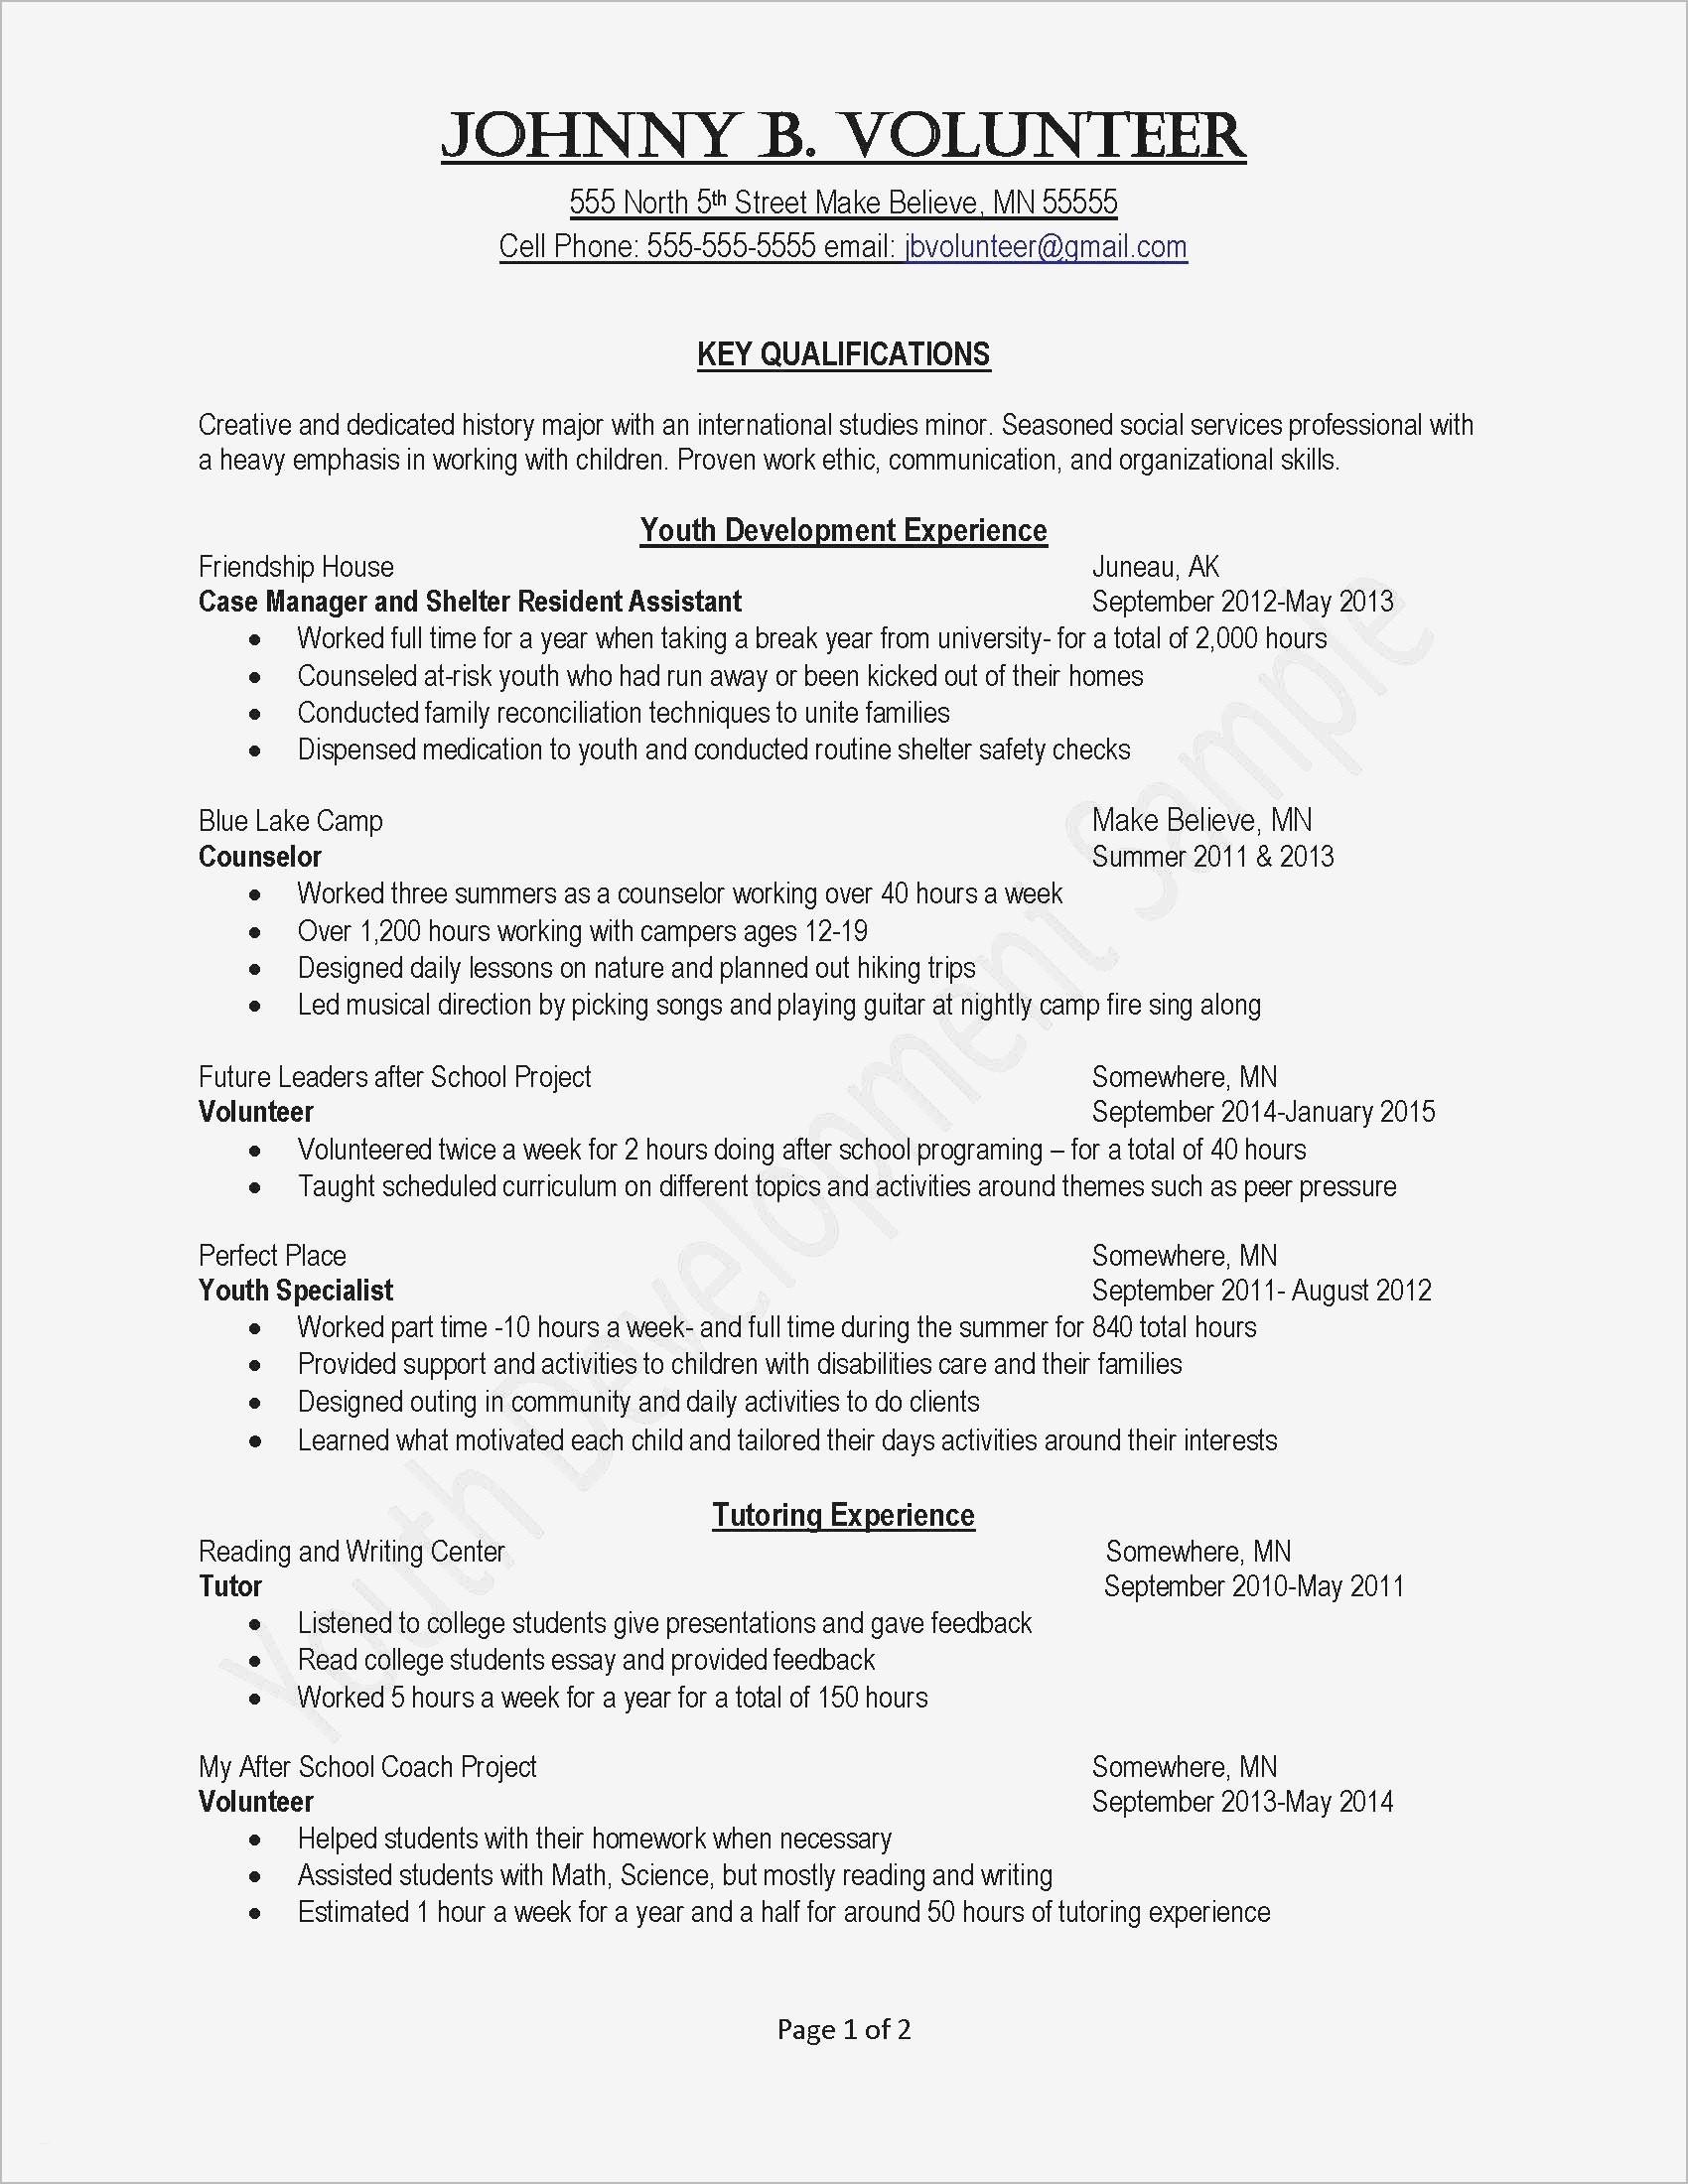 Free form Letter Template - Free Sample Job Fer Letter Fresh Job Fer Letter Template Us Copy